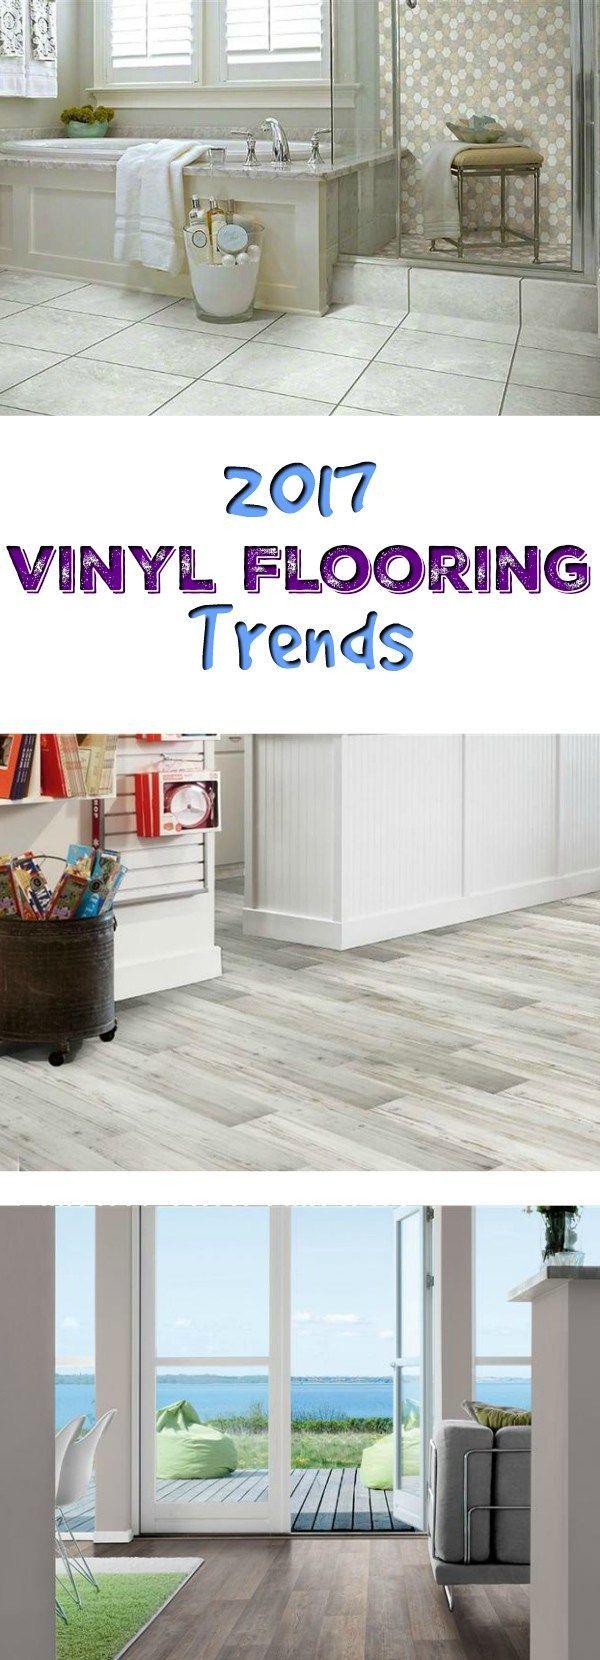 Bathroom floor options and cleaning tips flooring ideas floor - 2017 Vinyl Flooring Trends 16 Hot New Ideas